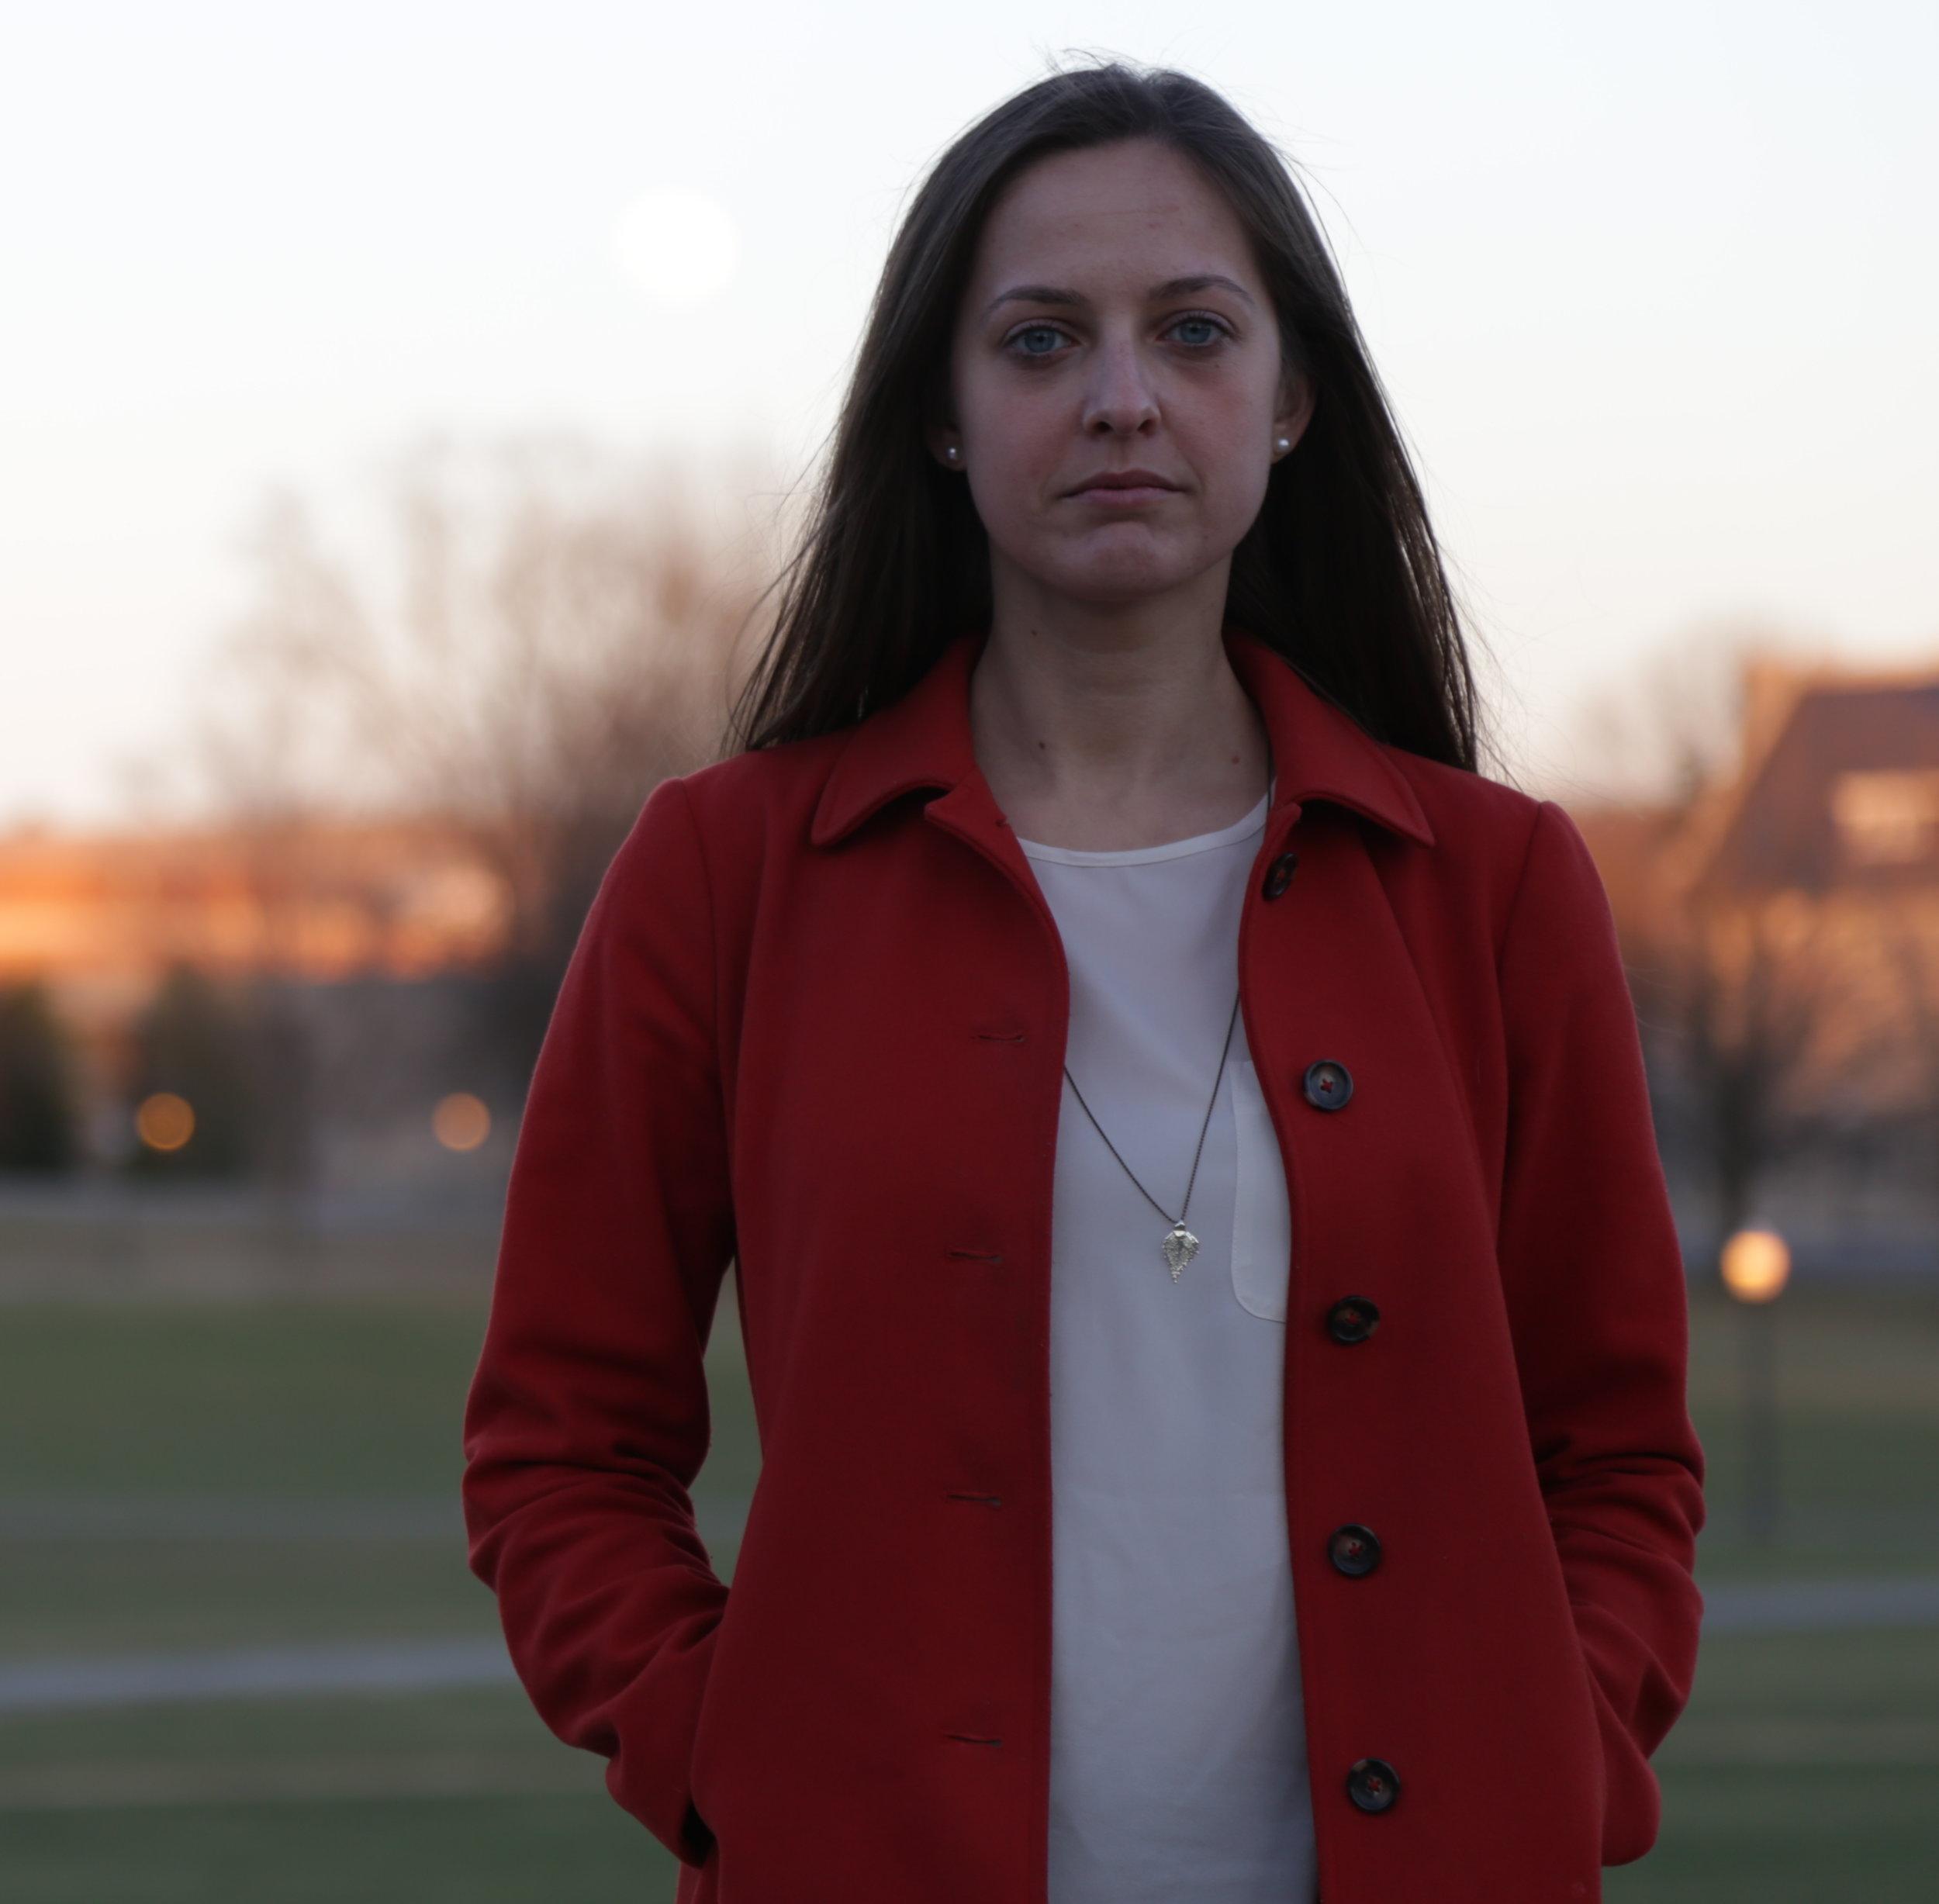 Kristina Anderson at Virginia Tech's April 16 Memorial. (Photo by Samuel Granillo, Columbine Survivor, Class of 2000)